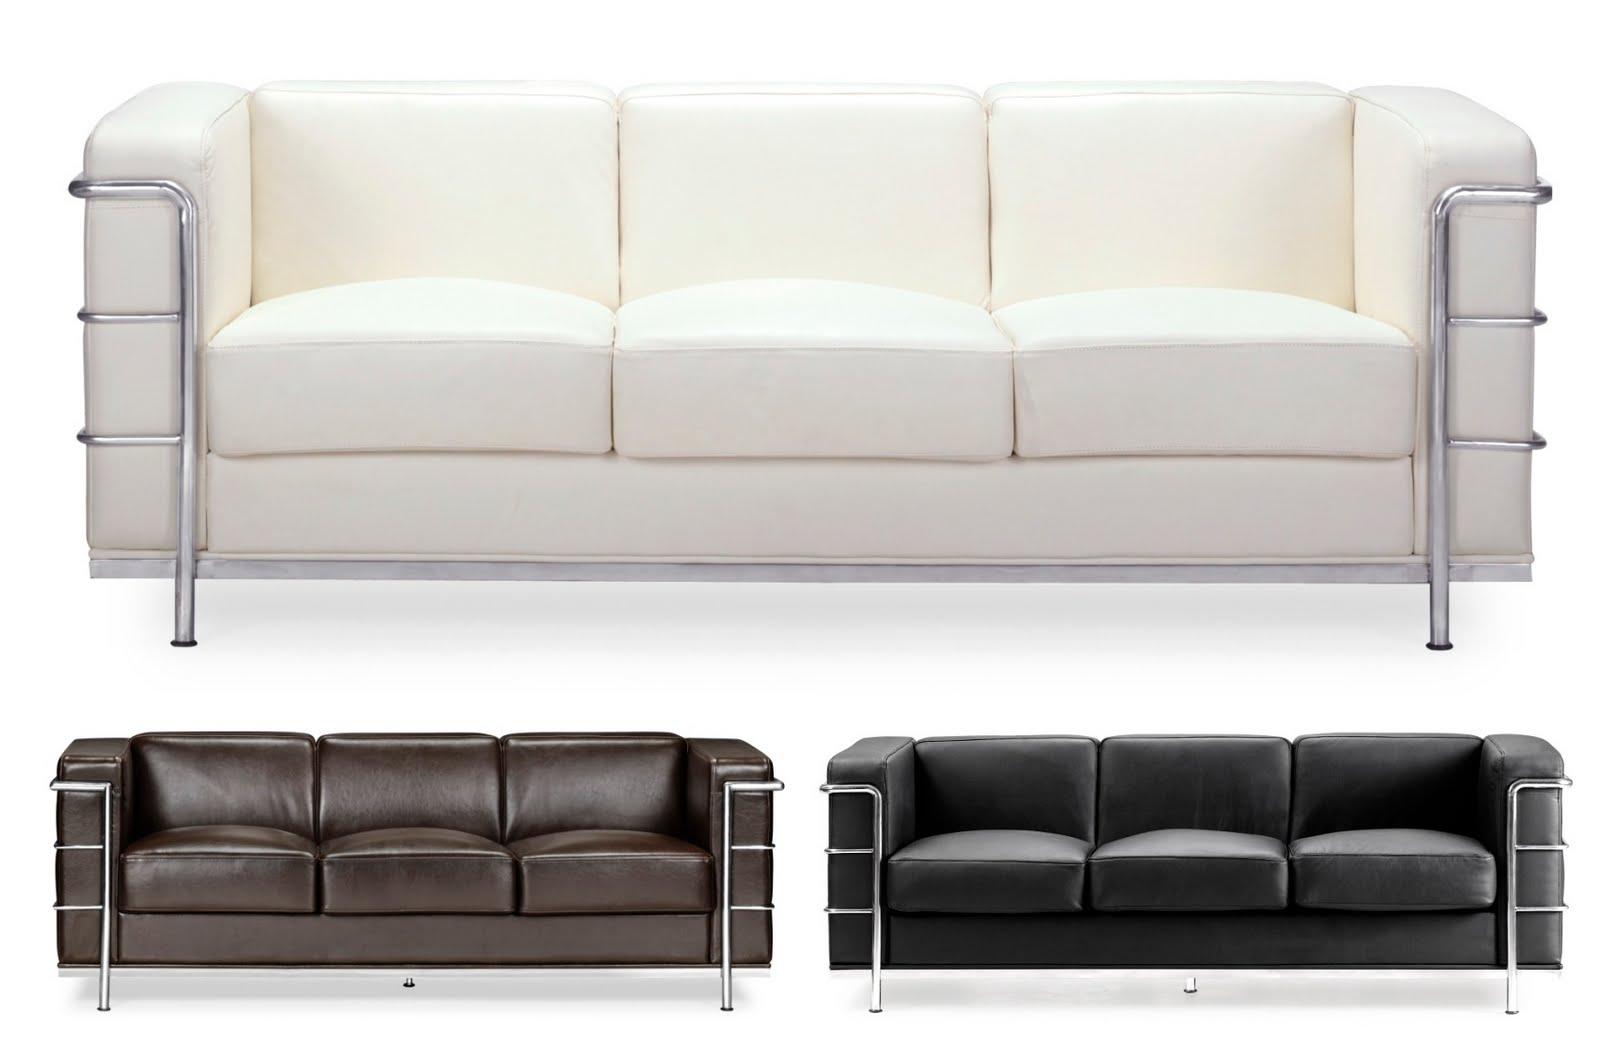 Craigslist Tampa Patio Furniture Decorating Interior Of Your House